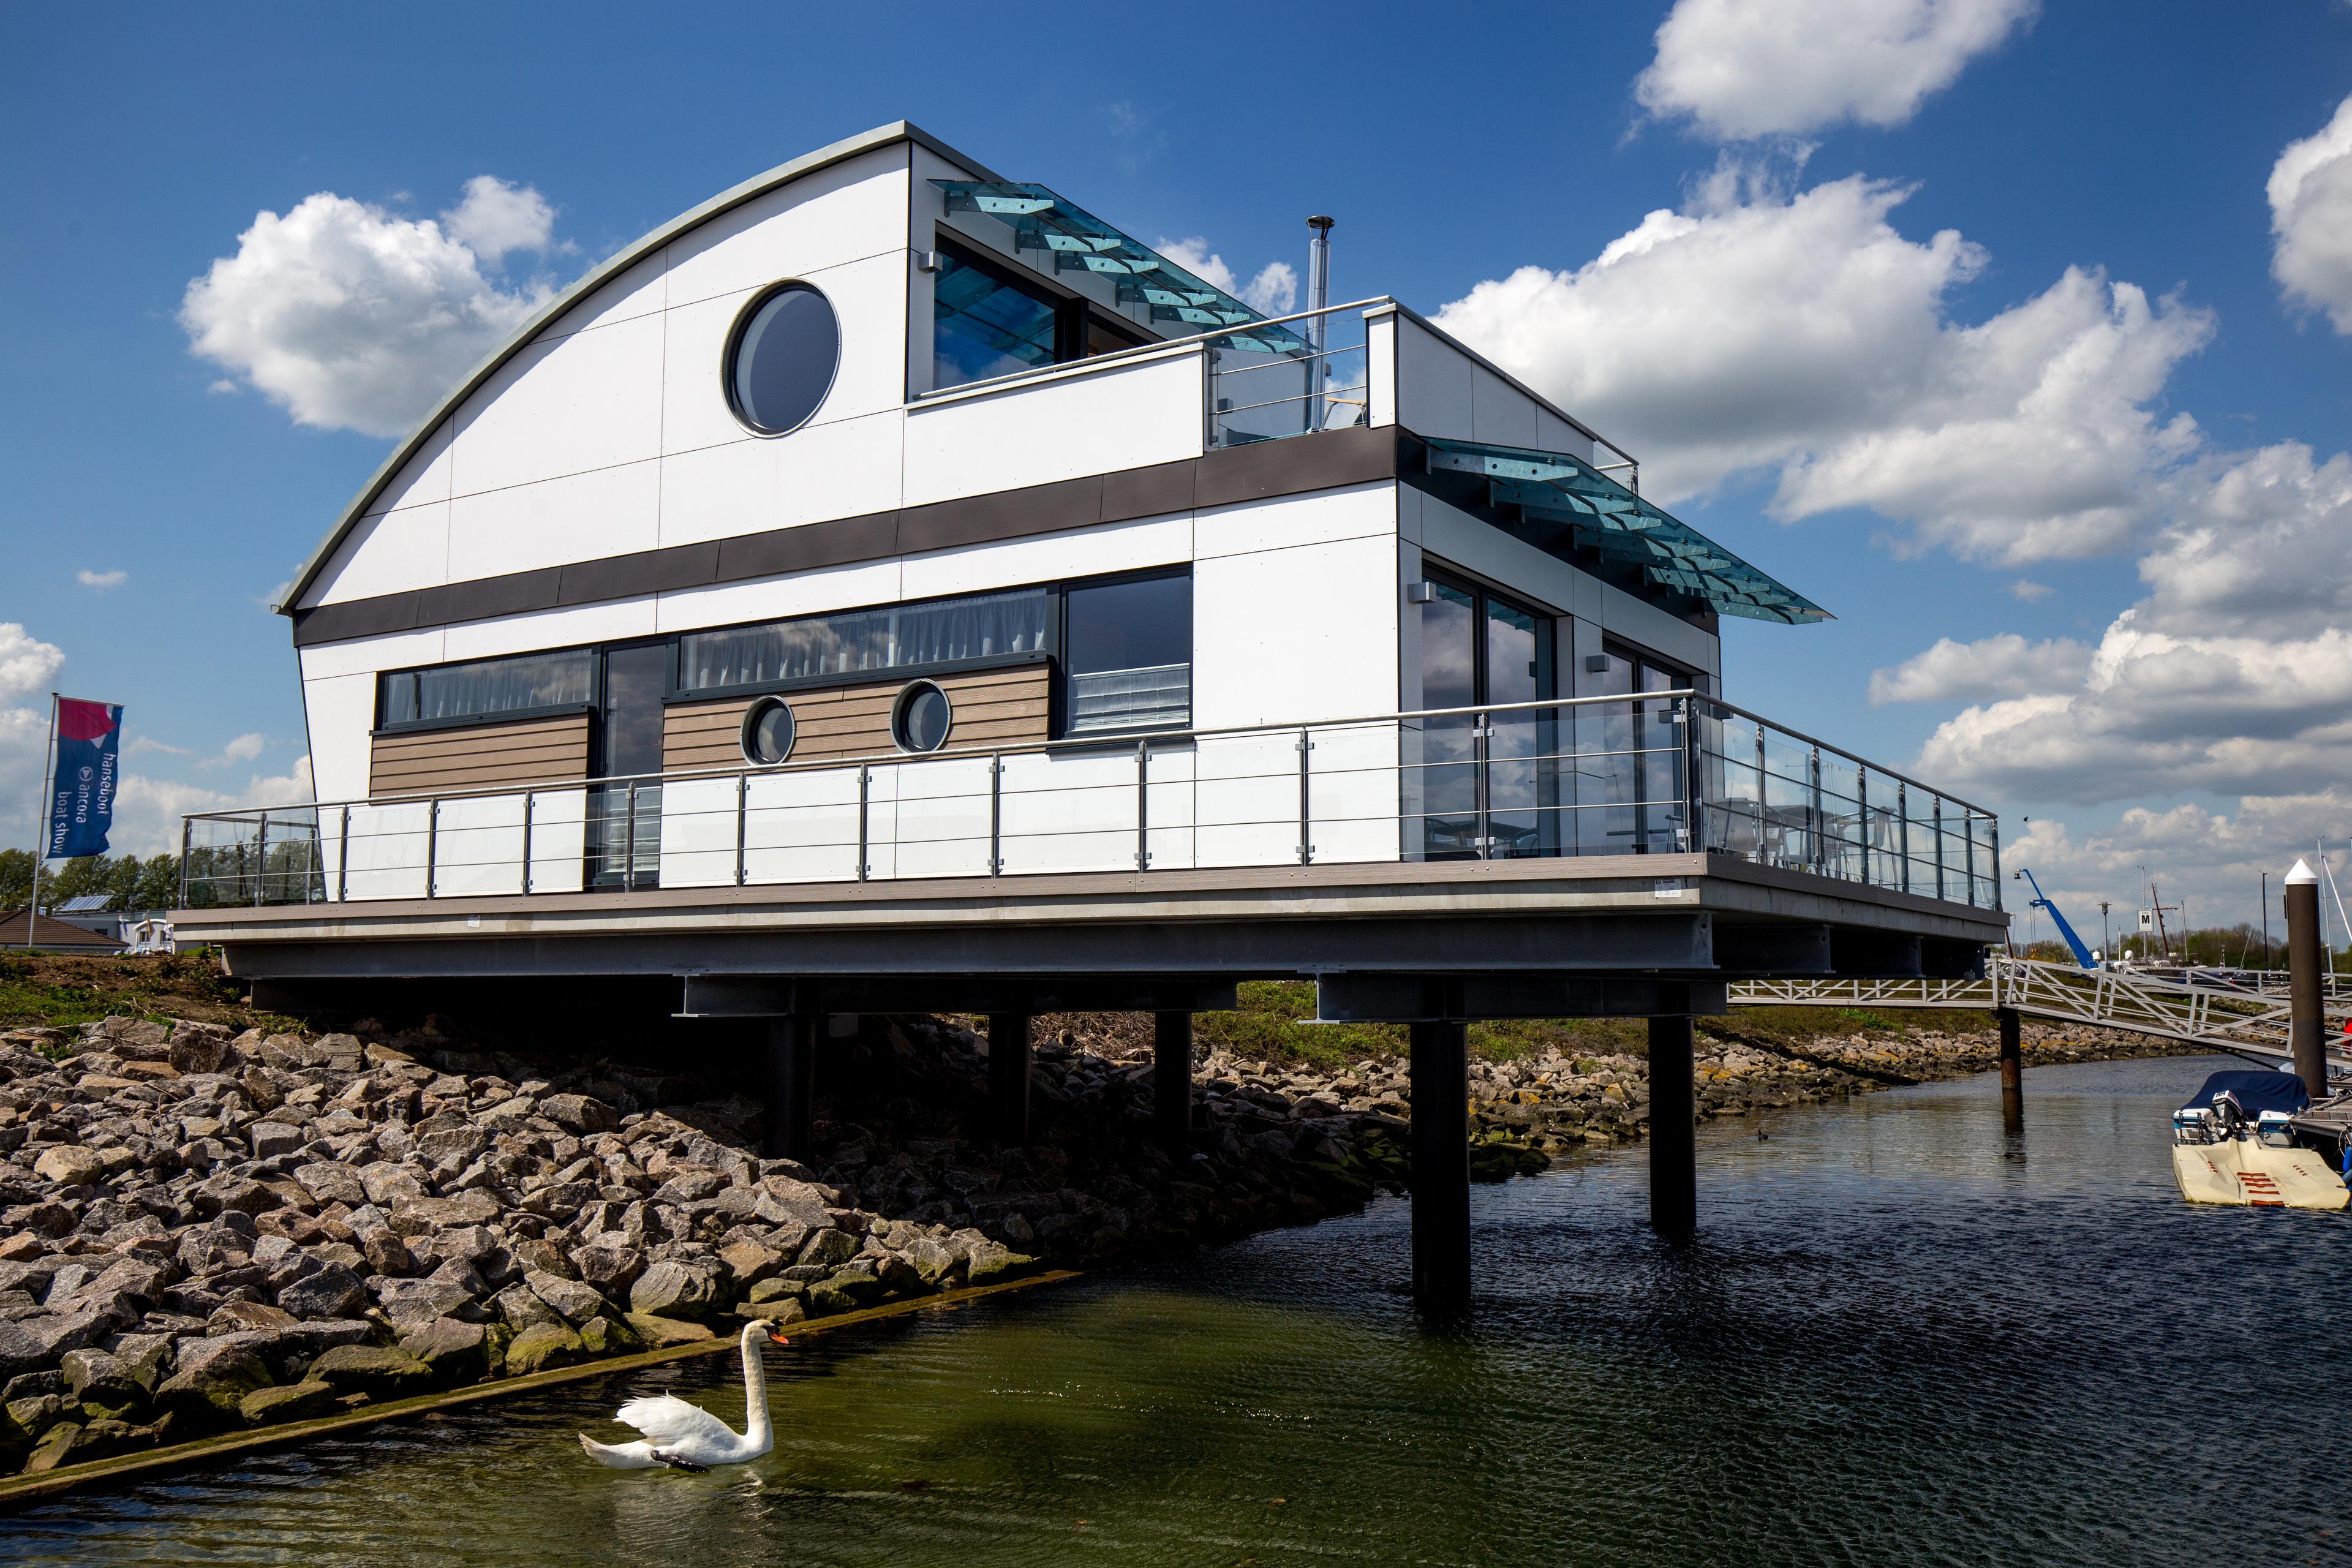 KYST 54°10 Floating Home 1 Ferienhaus in Thüringen